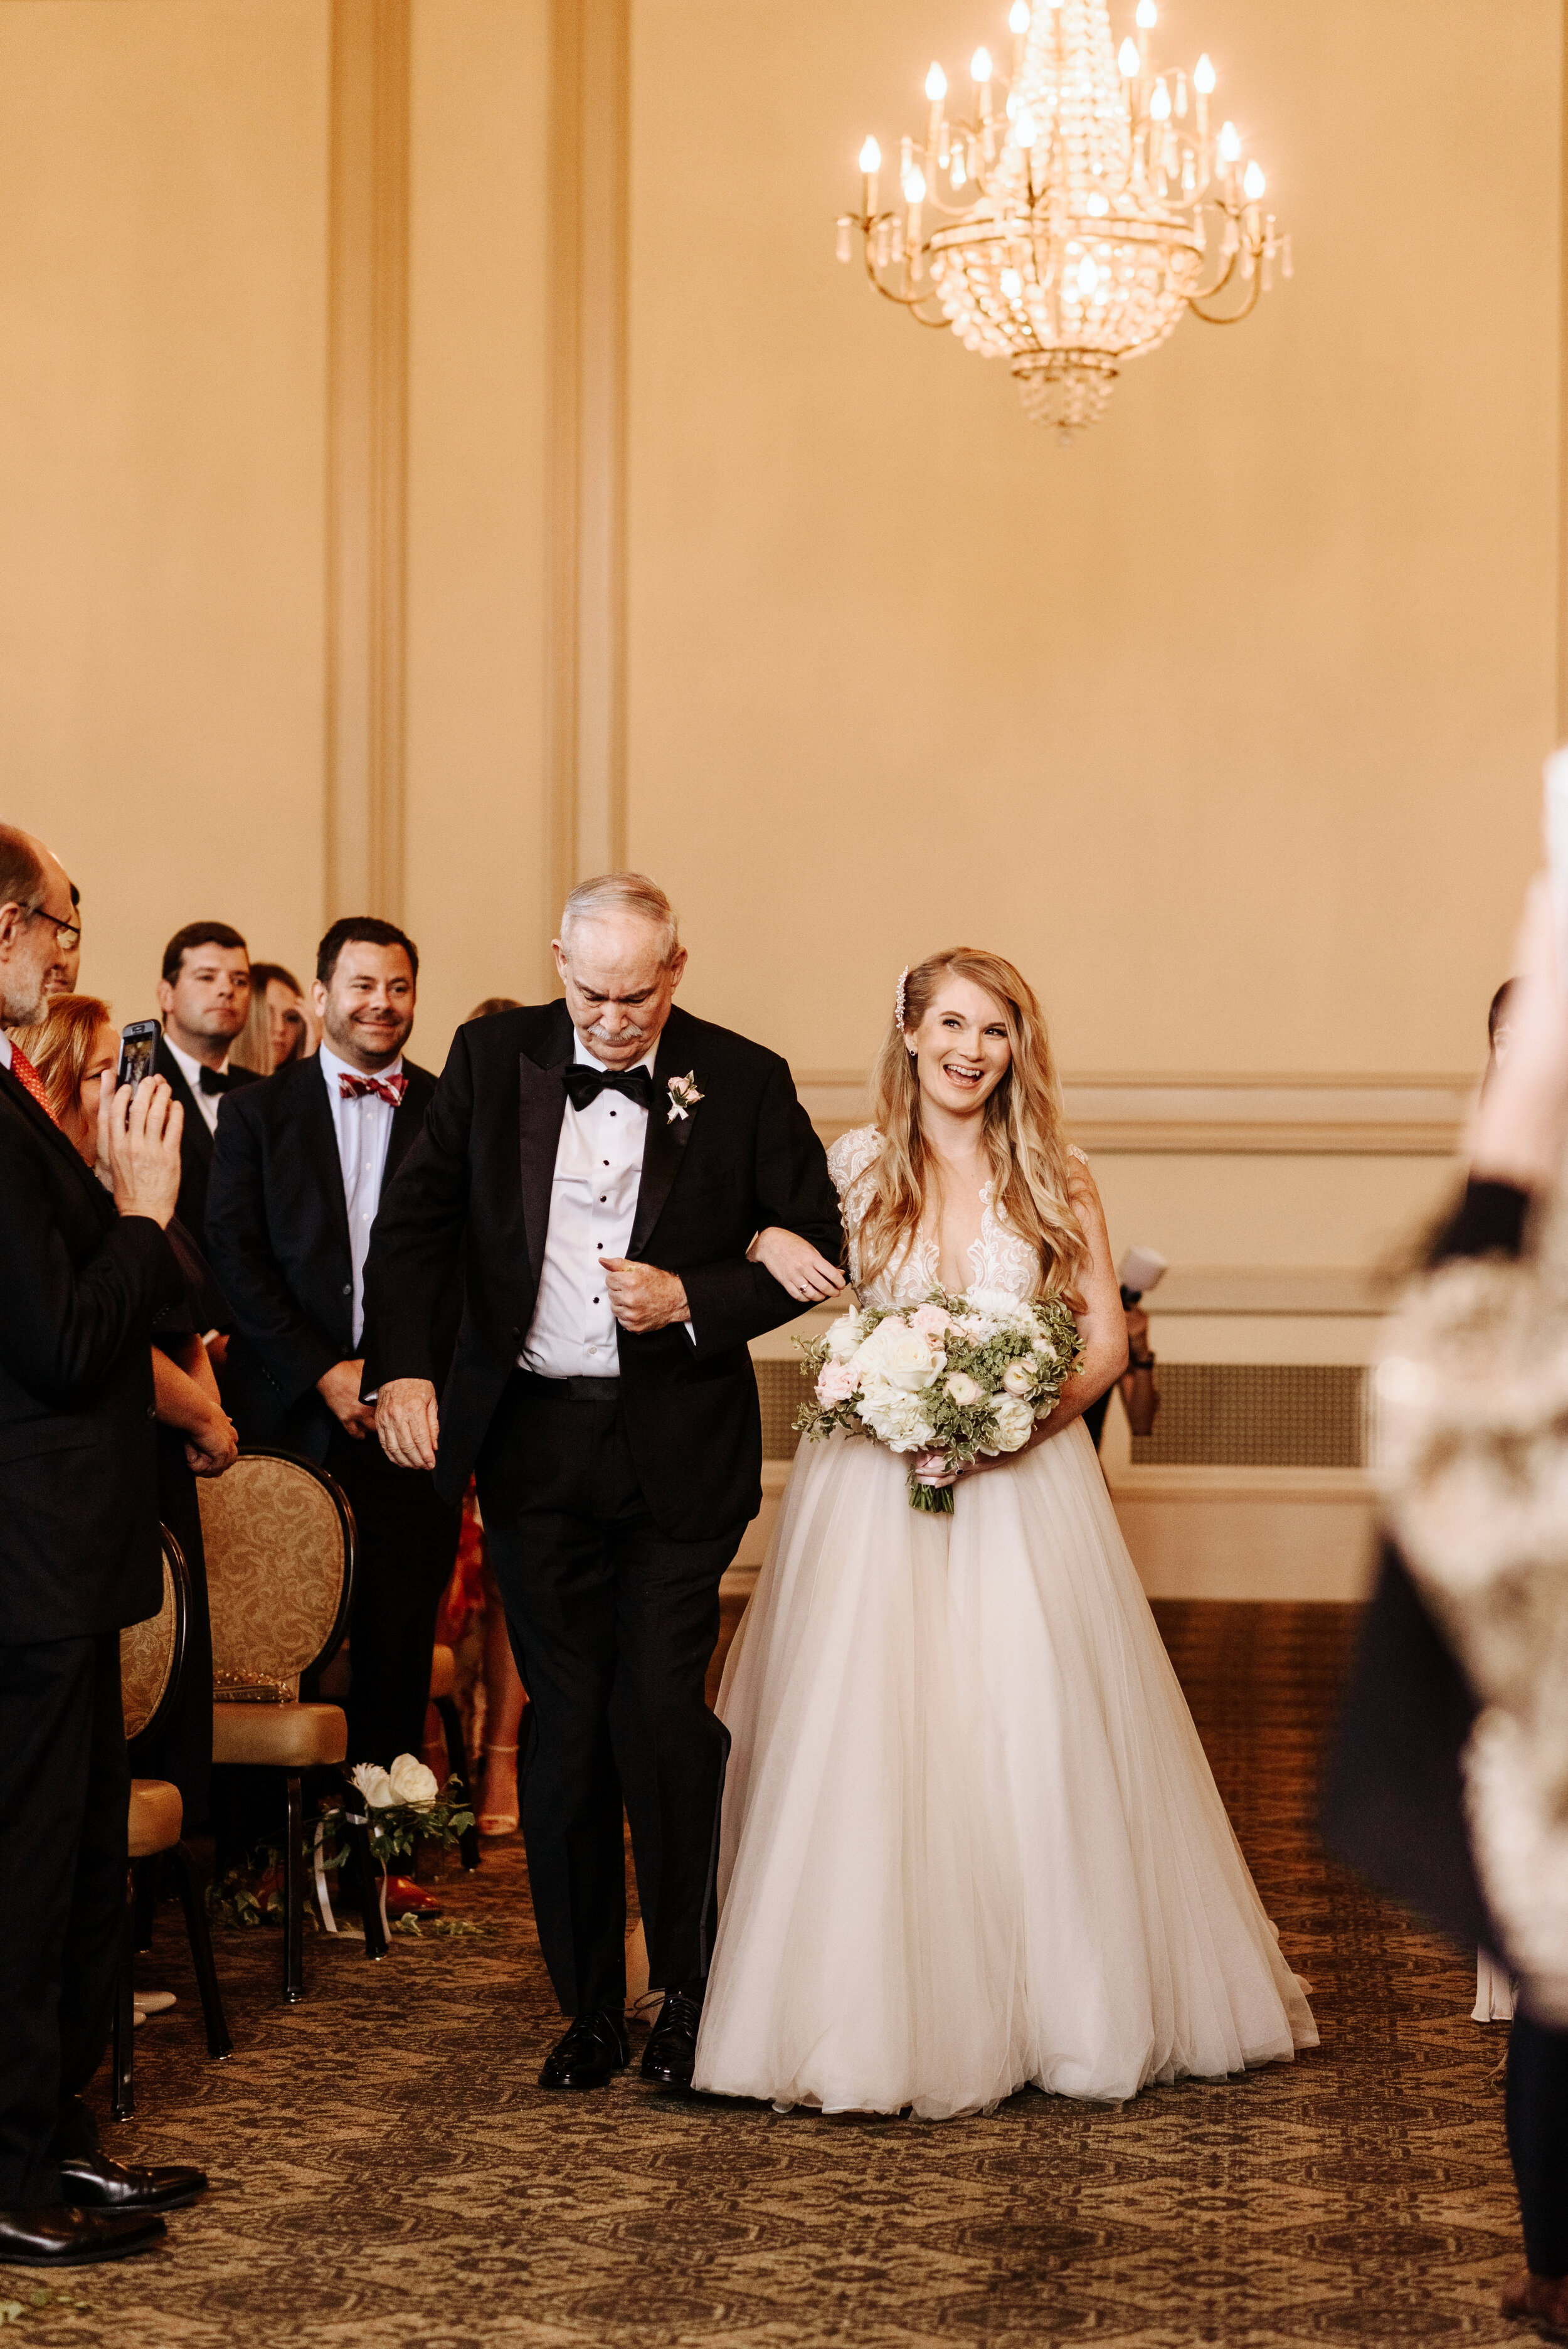 Cassie-Mrunal-Wedding-Quirk-Hotel-John-Marshall-Ballrooms-Richmond-Virginia-Photography-by-V-69.jpg